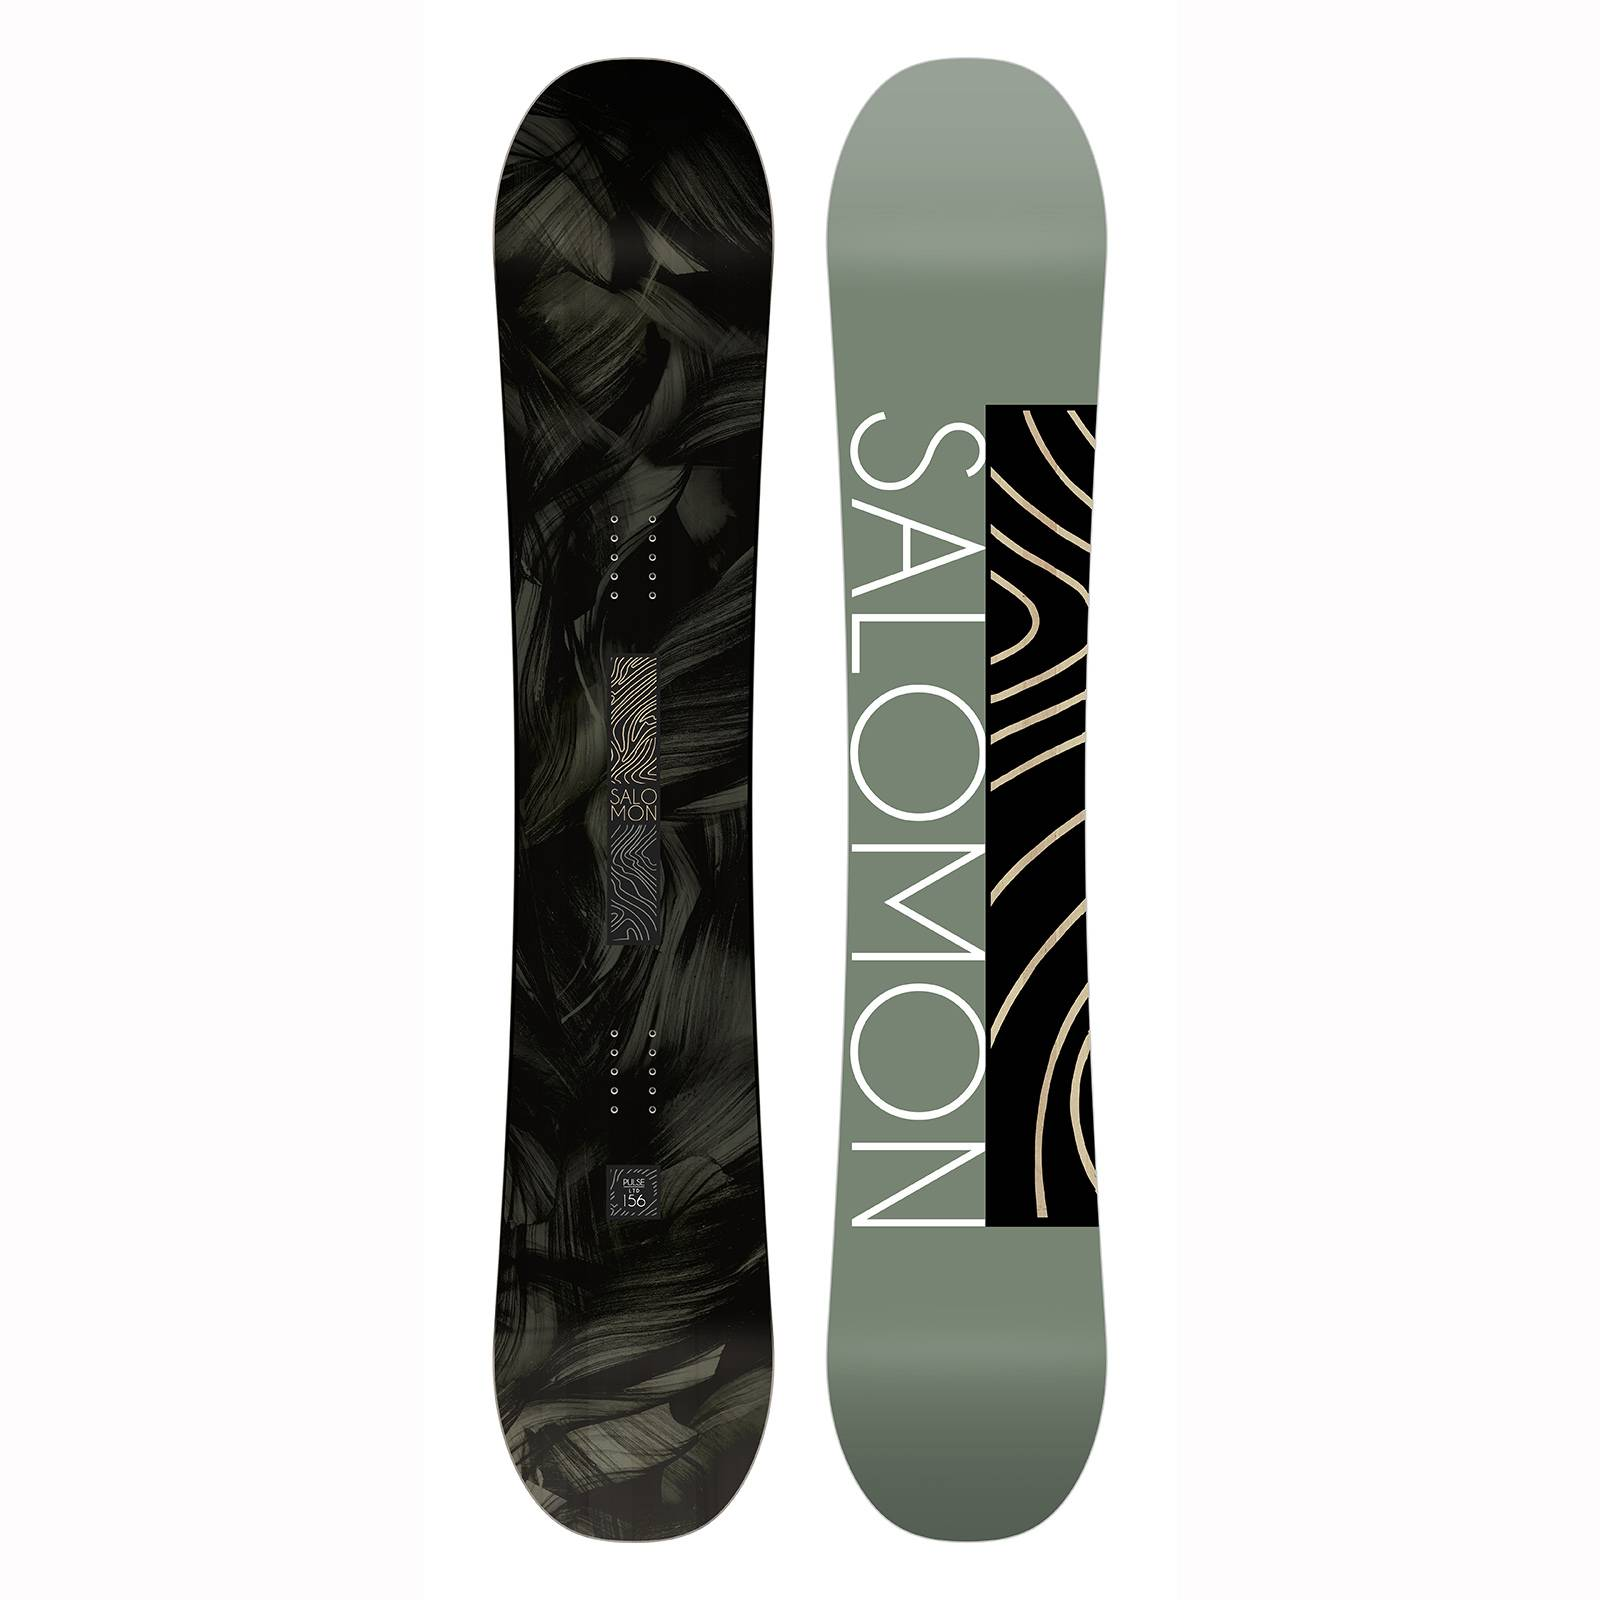 salomon Pack De Snowboard Salomon Pulse Ltd+rhythm Black Homme